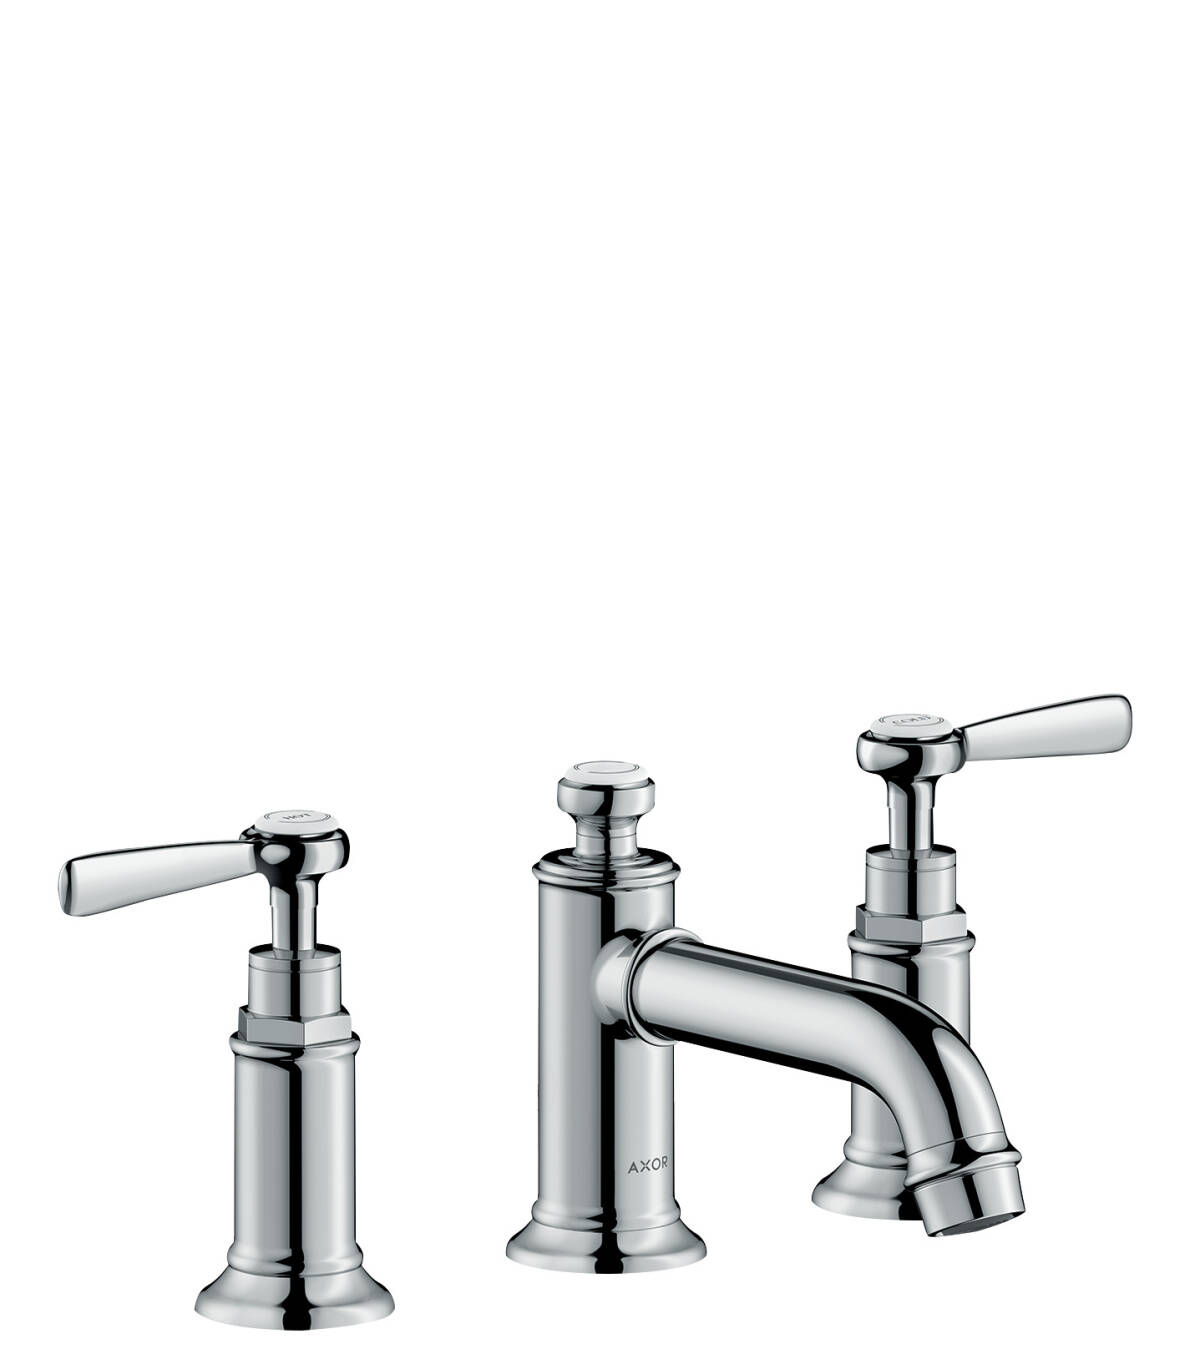 axor montreux washbasin mixers chrome 16535000. Black Bedroom Furniture Sets. Home Design Ideas